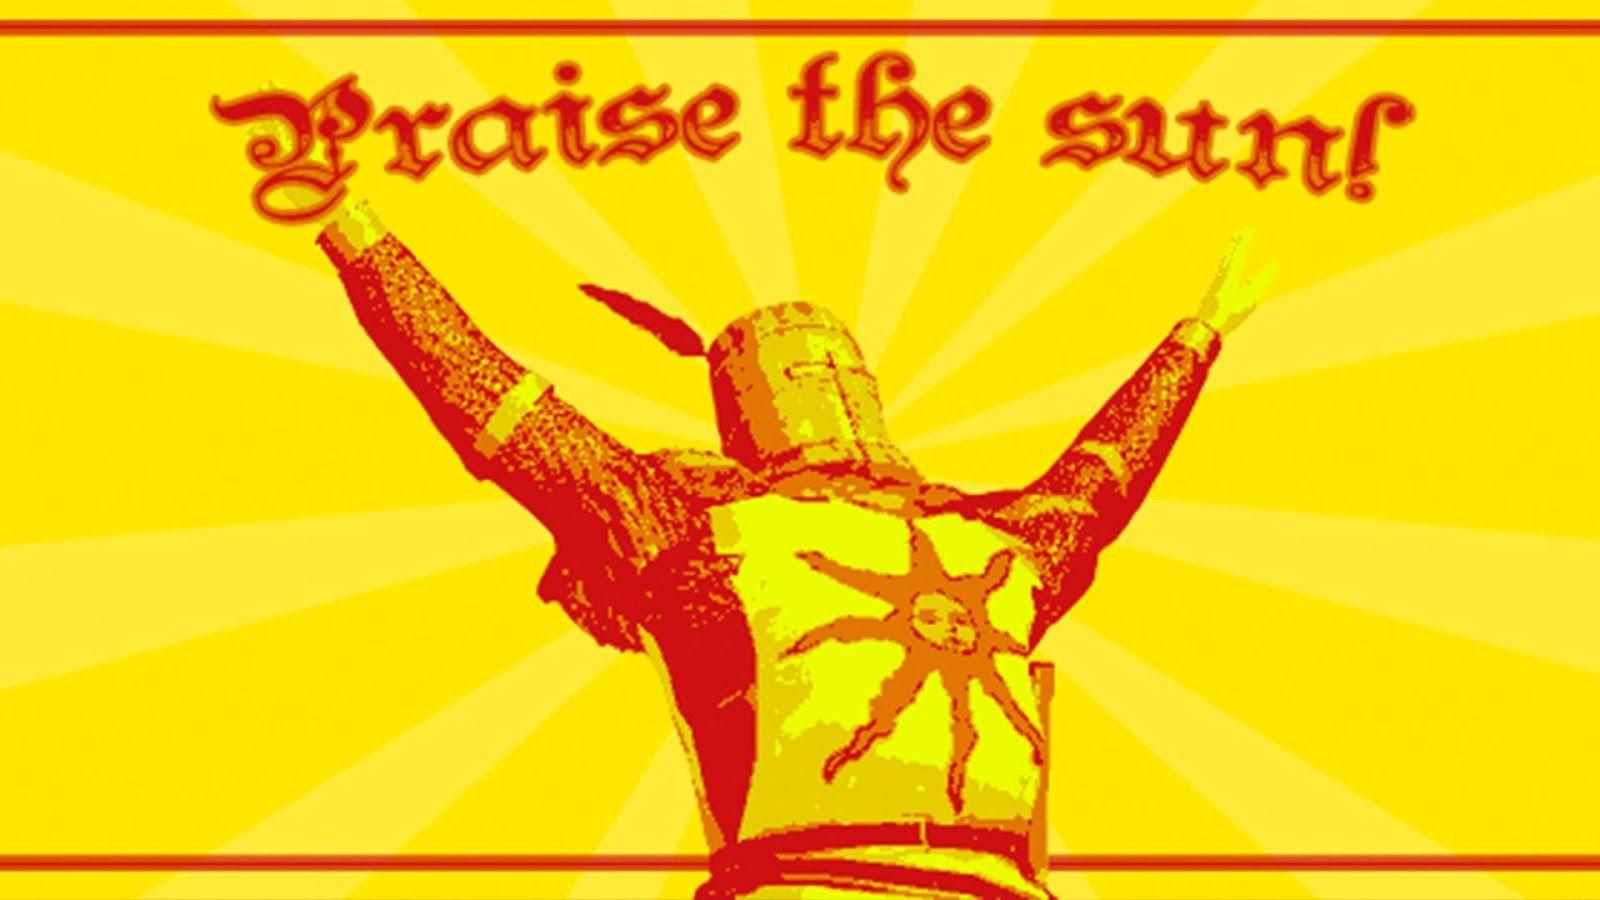 Praise The Sun Dark Souls 2021 Live Wallpaper Hd Dark Souls Praise The Sun Dark Souls Game